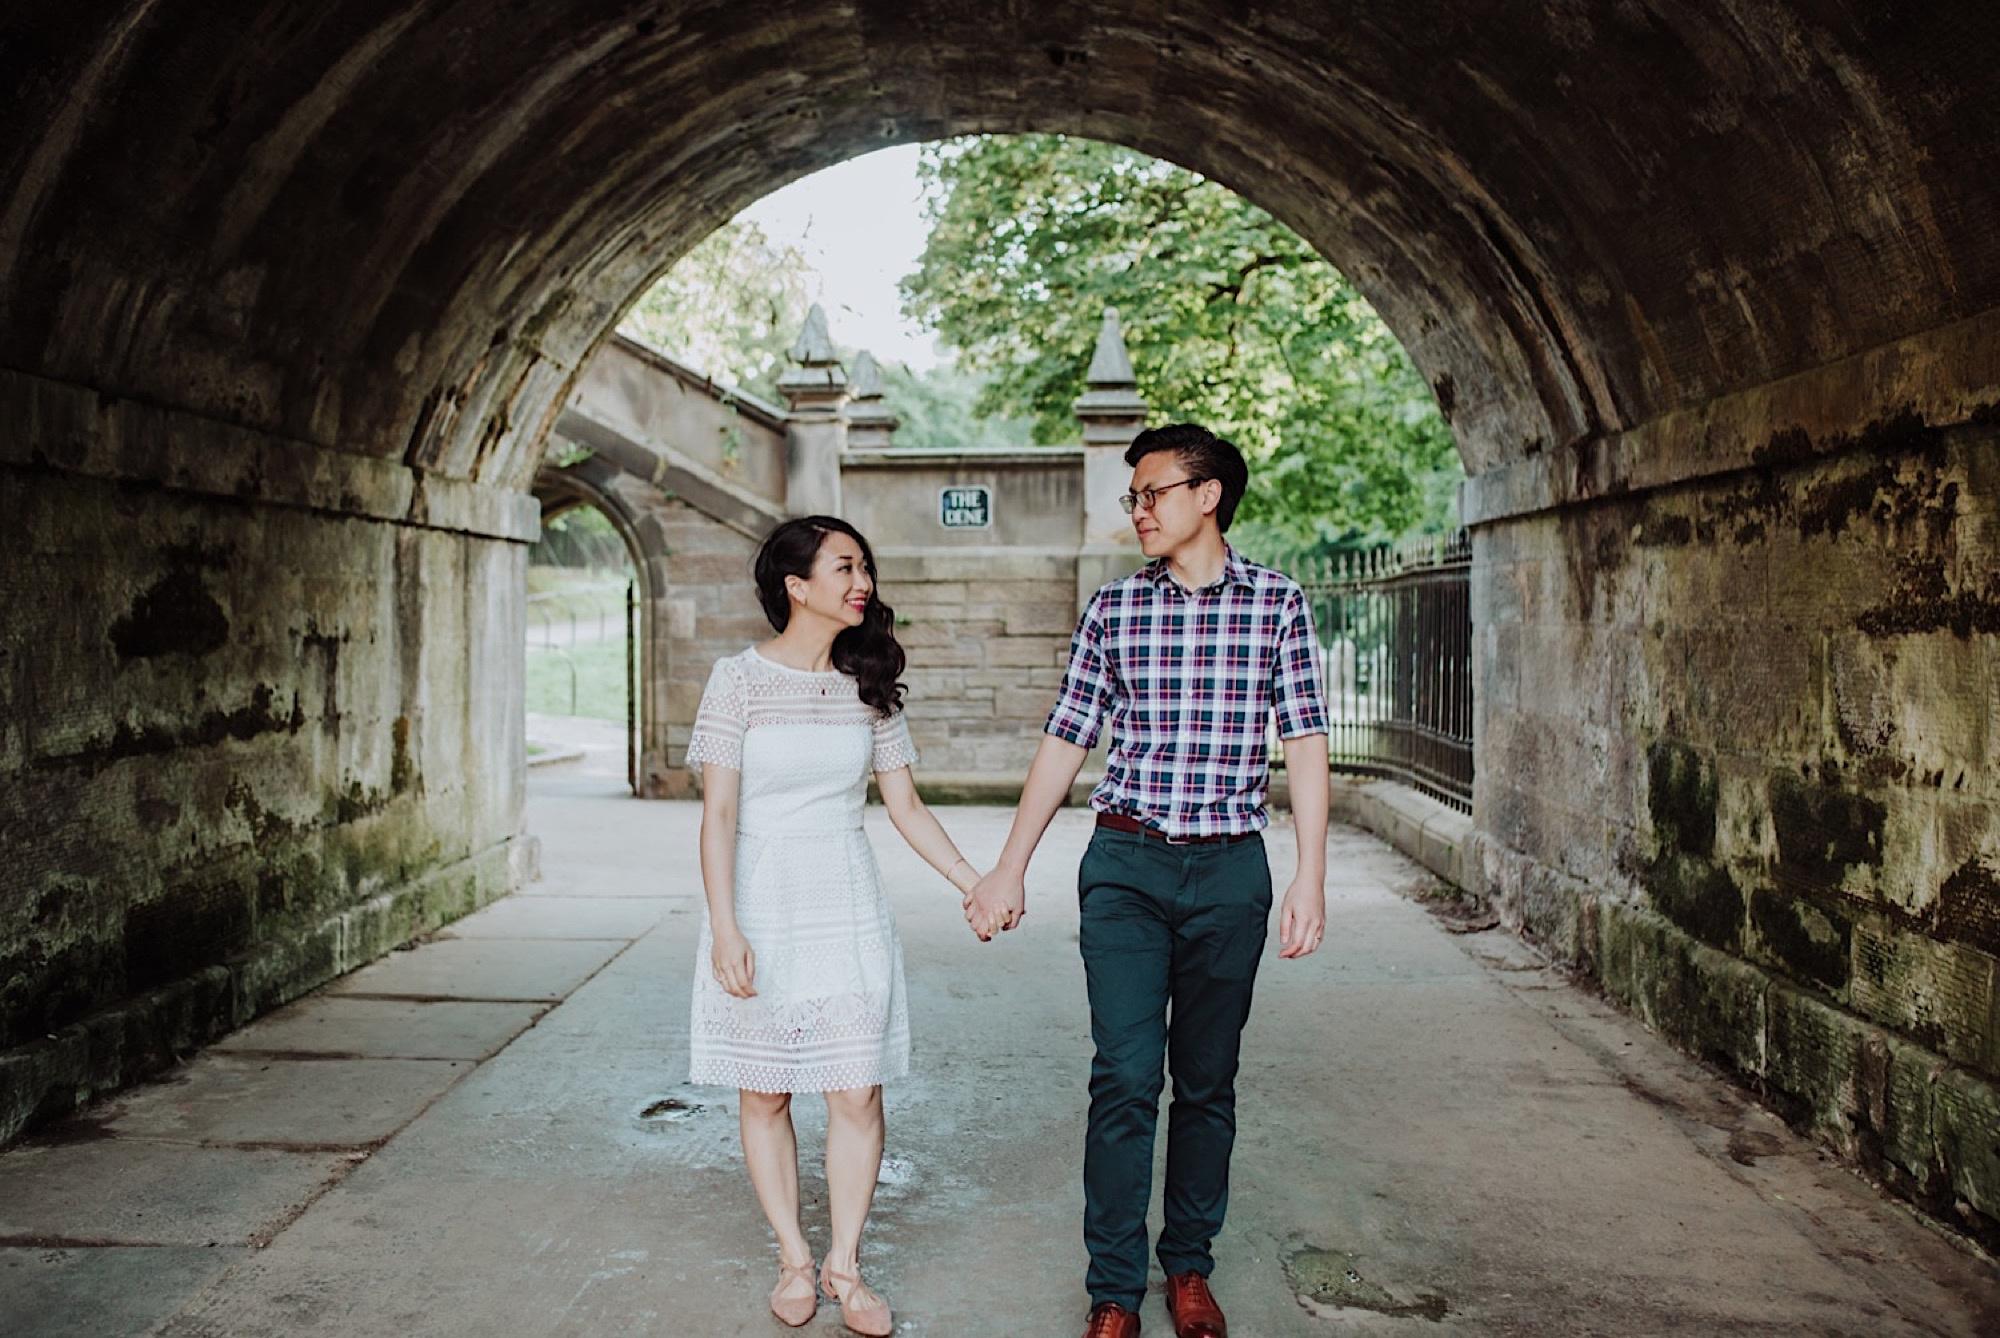 edinburgh engagement photo shoot